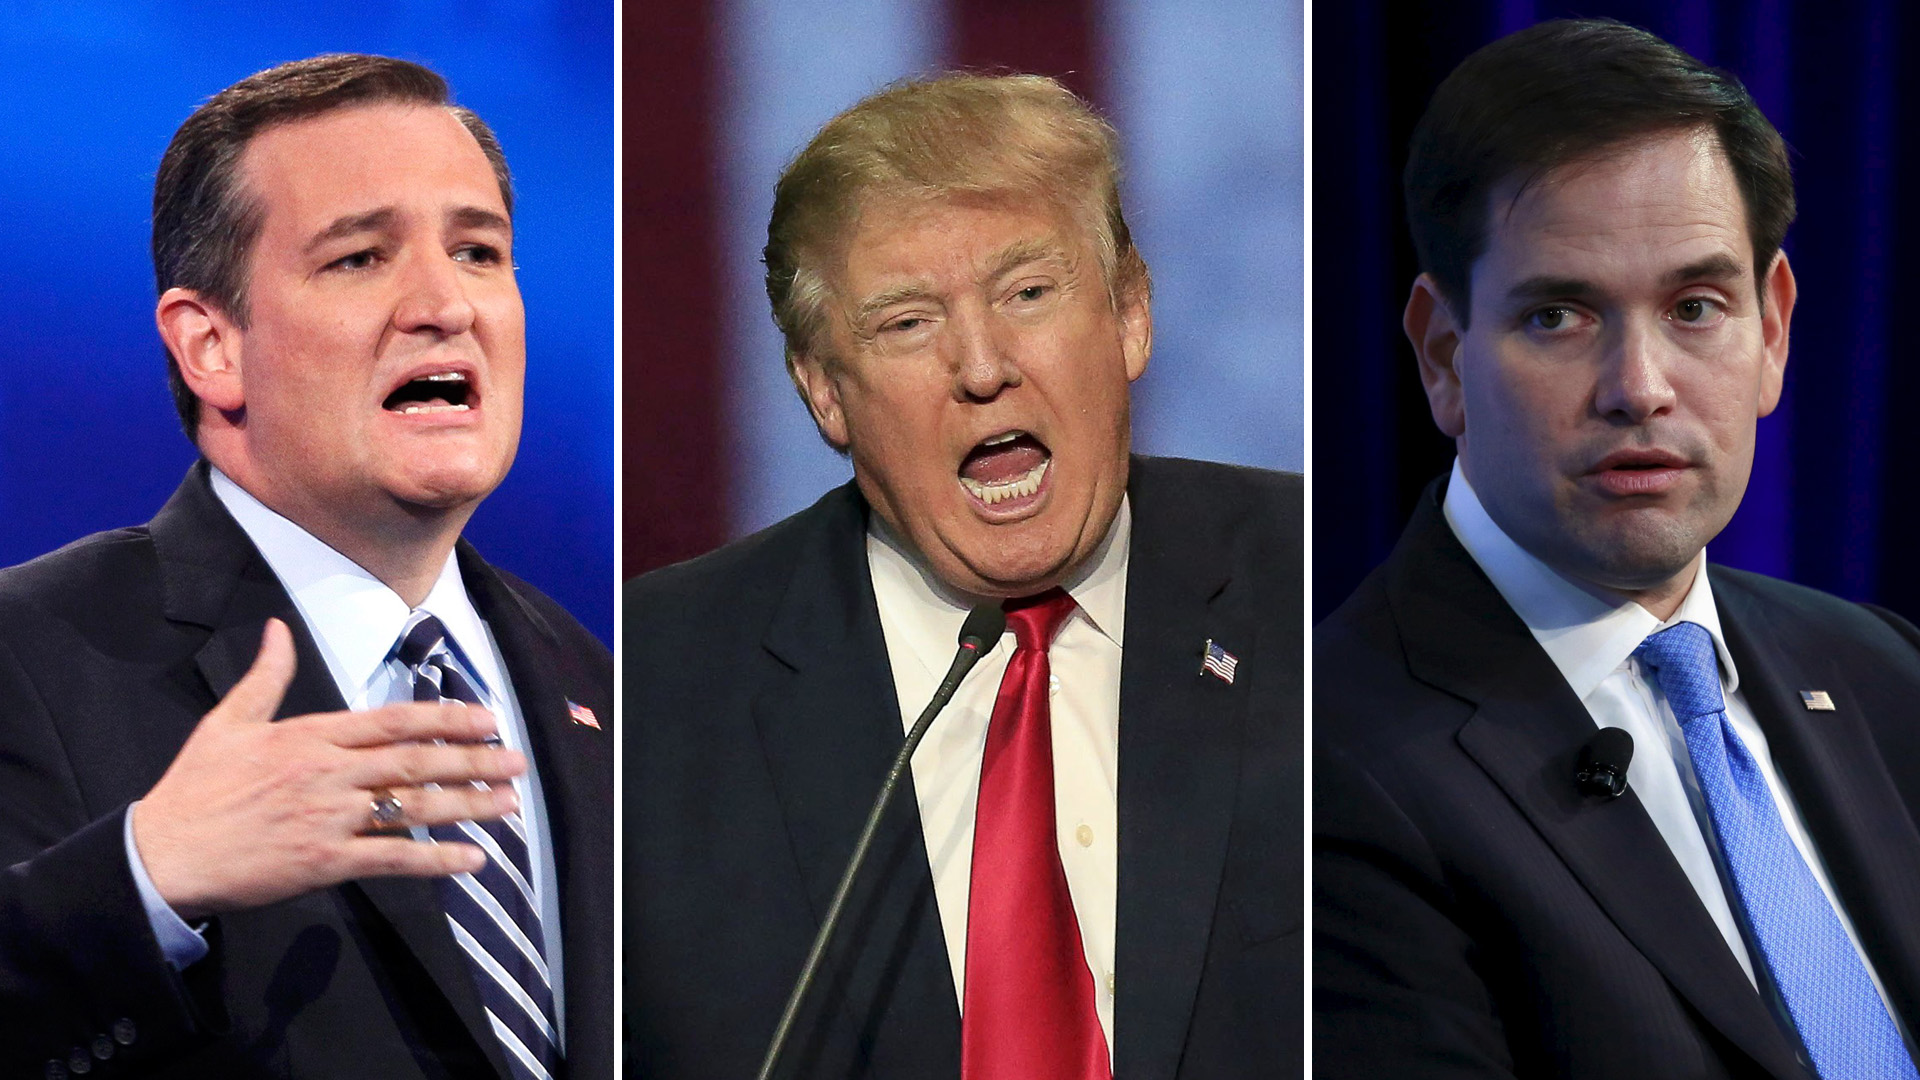 GOP Candidates, trump, rubio, cruz